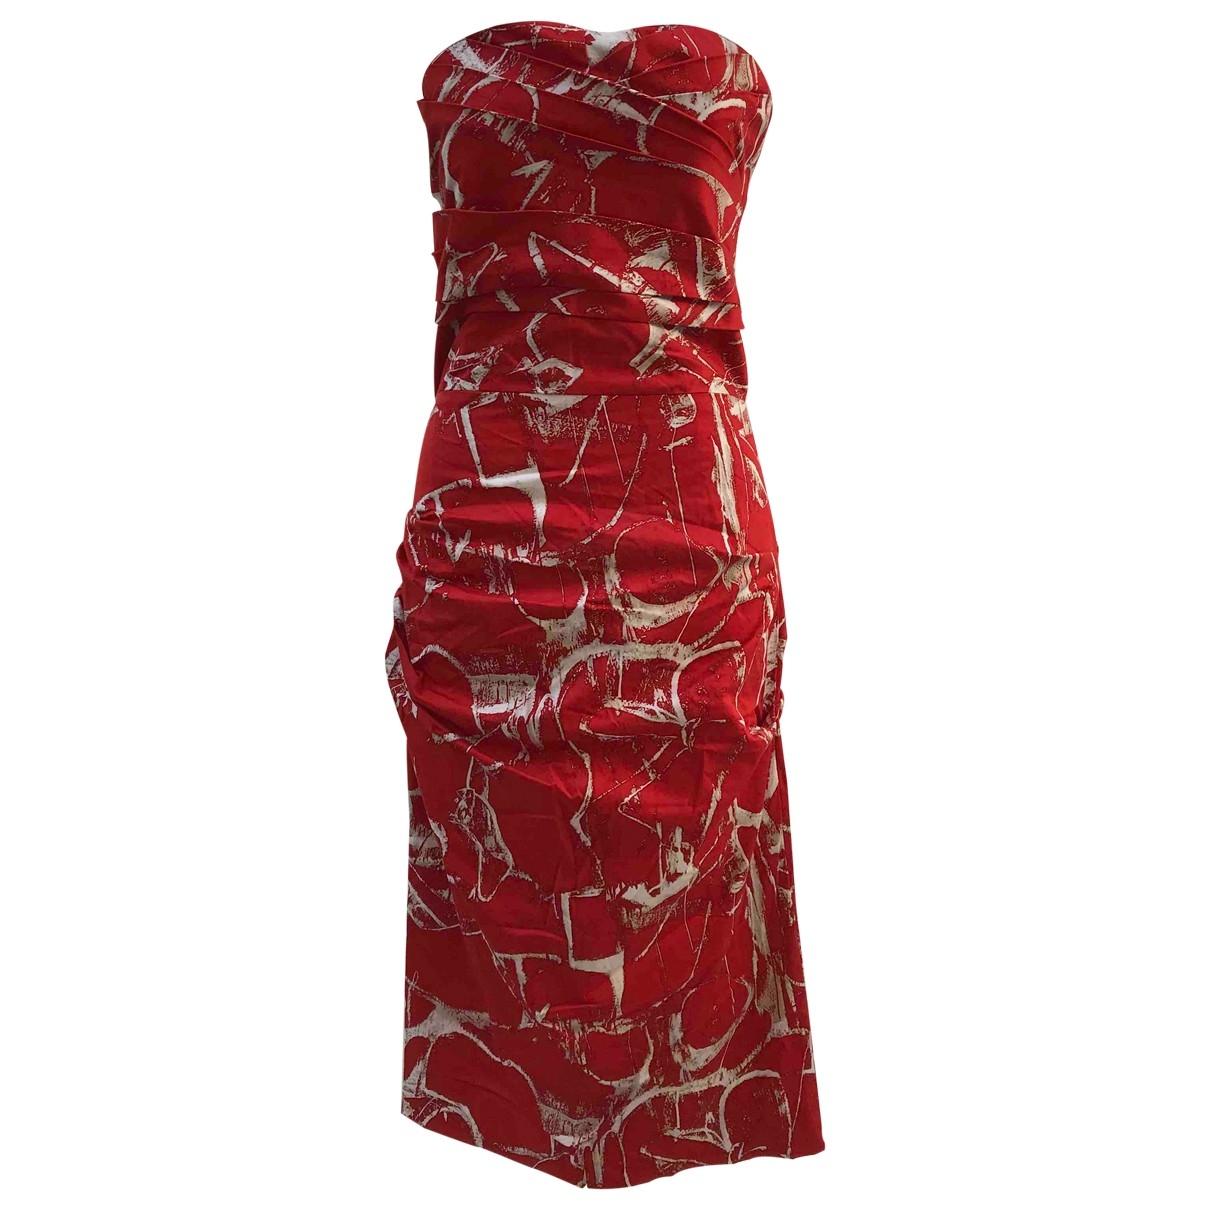 Samantha Sung \N Kleid in  Rot Baumwolle - Elasthan